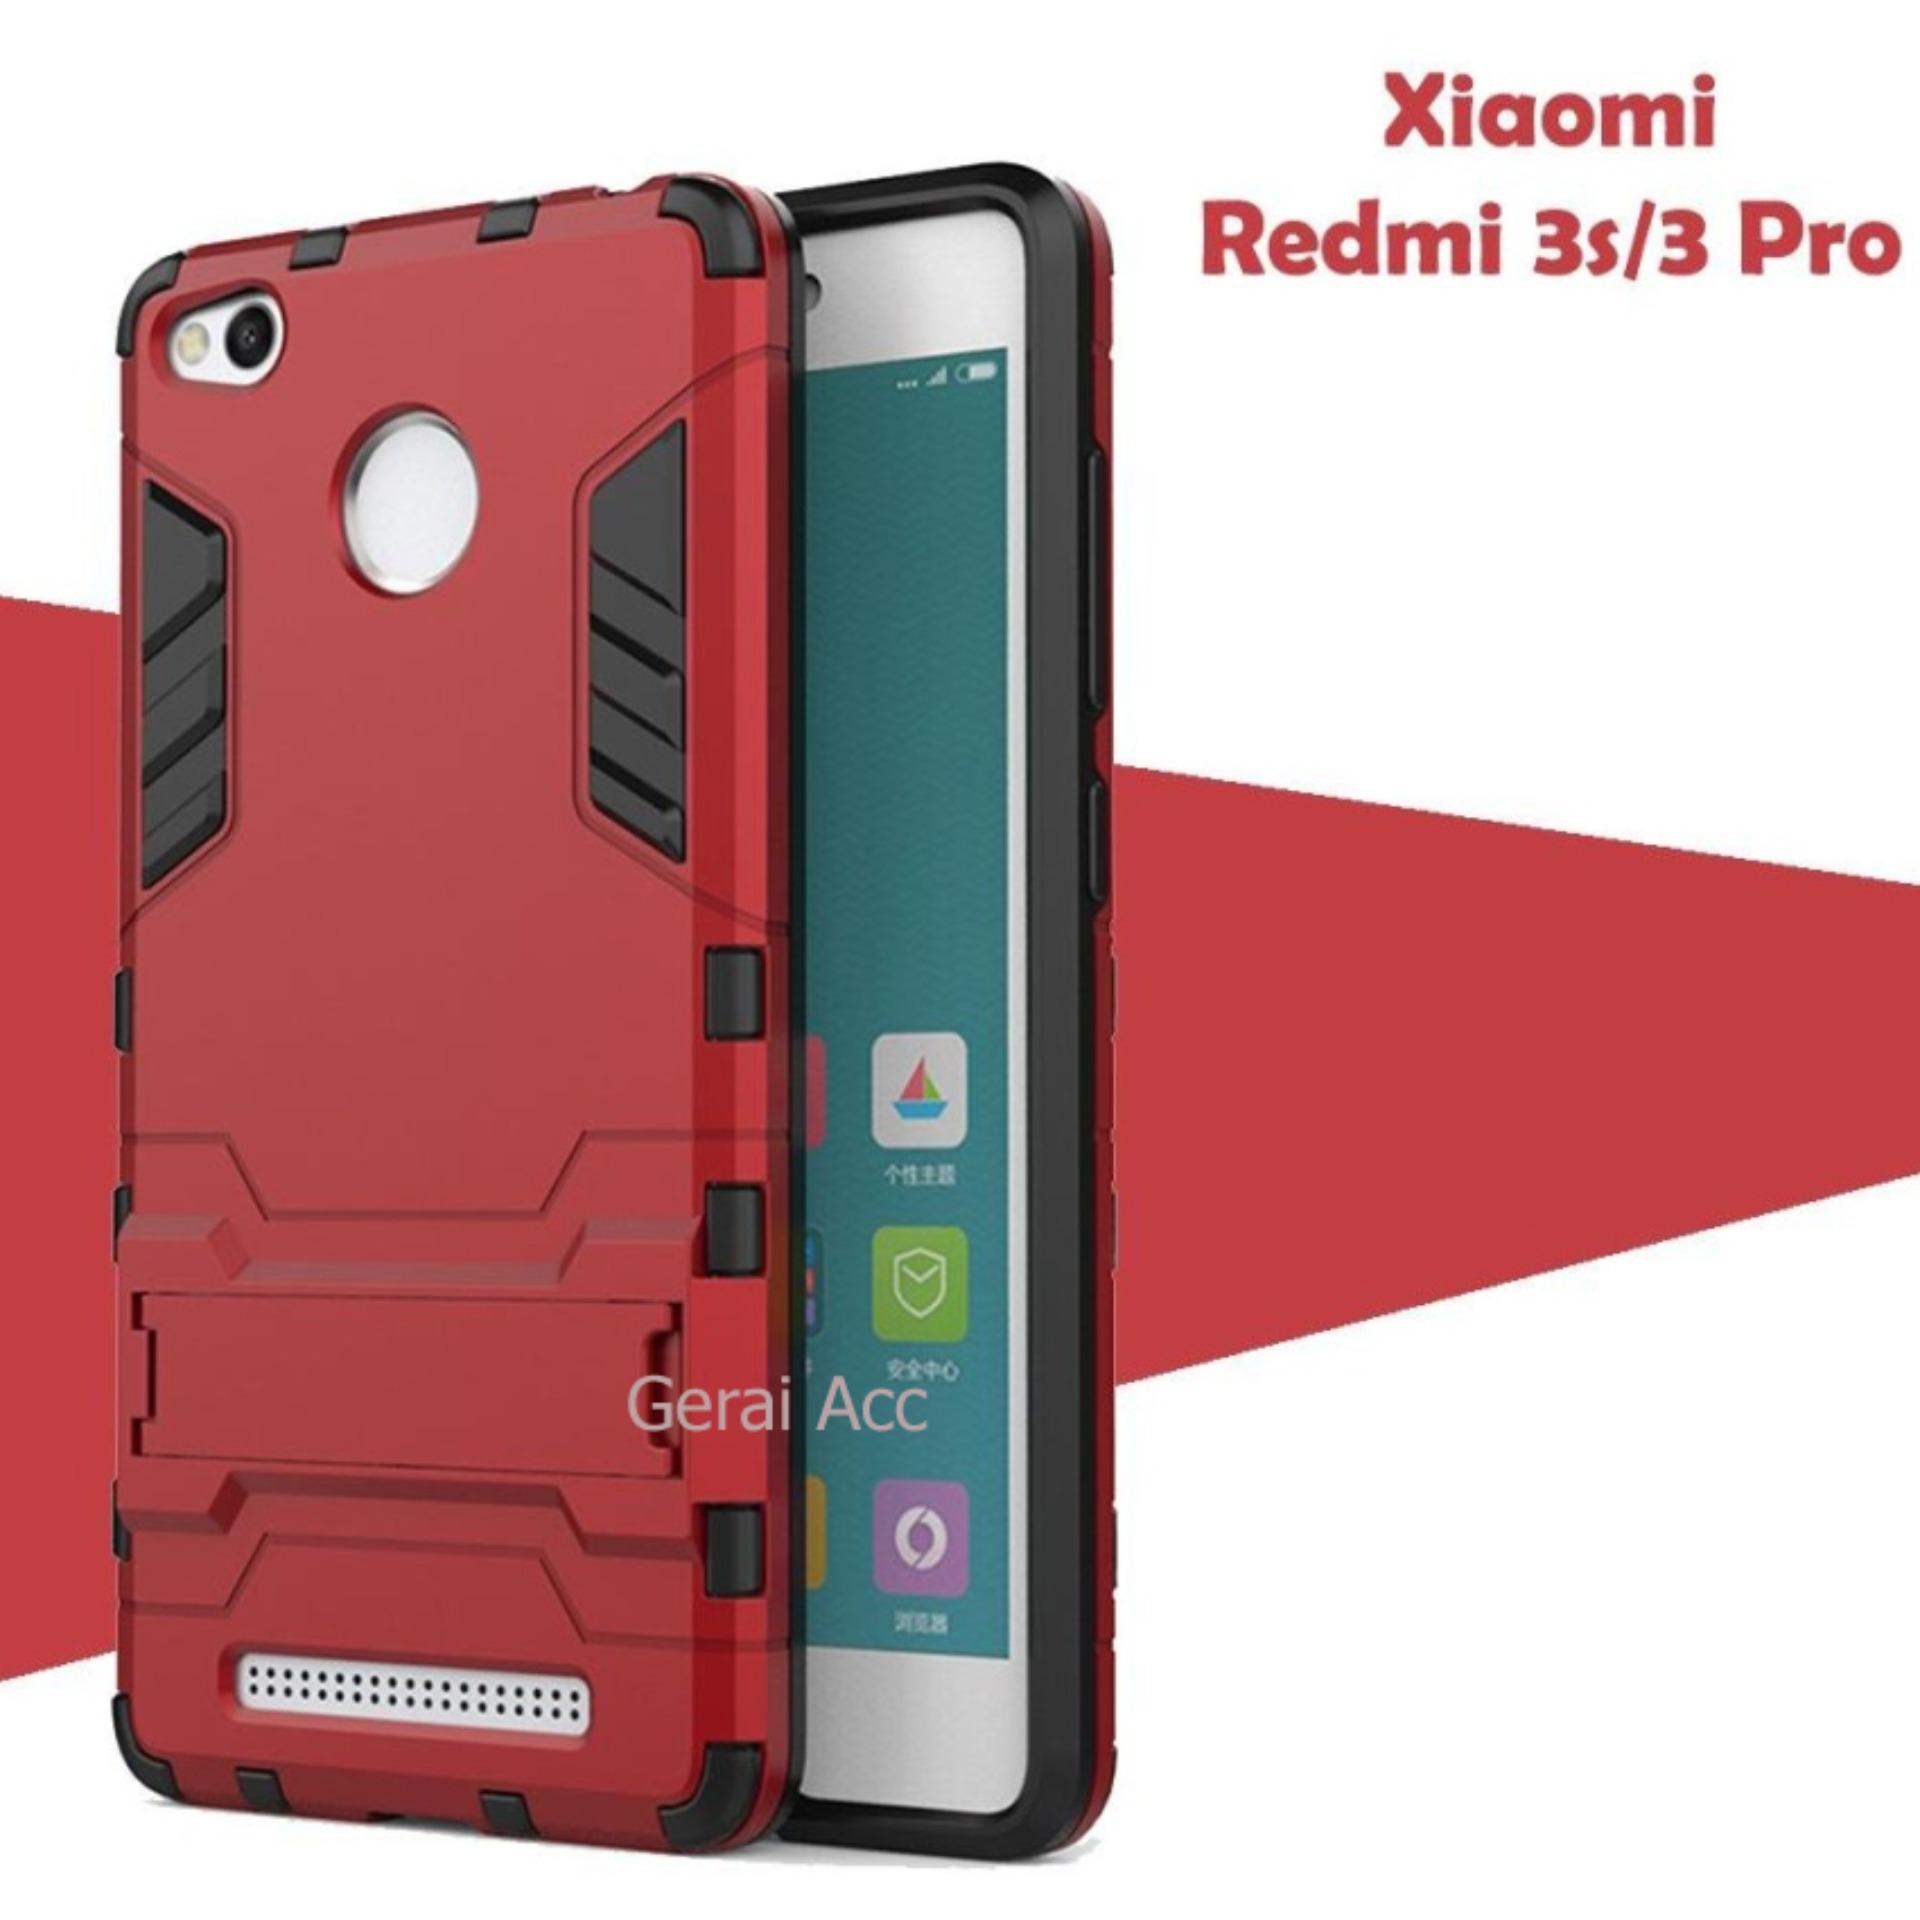 Case For Xiaomi Redmi 3s / 3 Pro / 3 Prime Iron Man Transformer Kickstand - Red